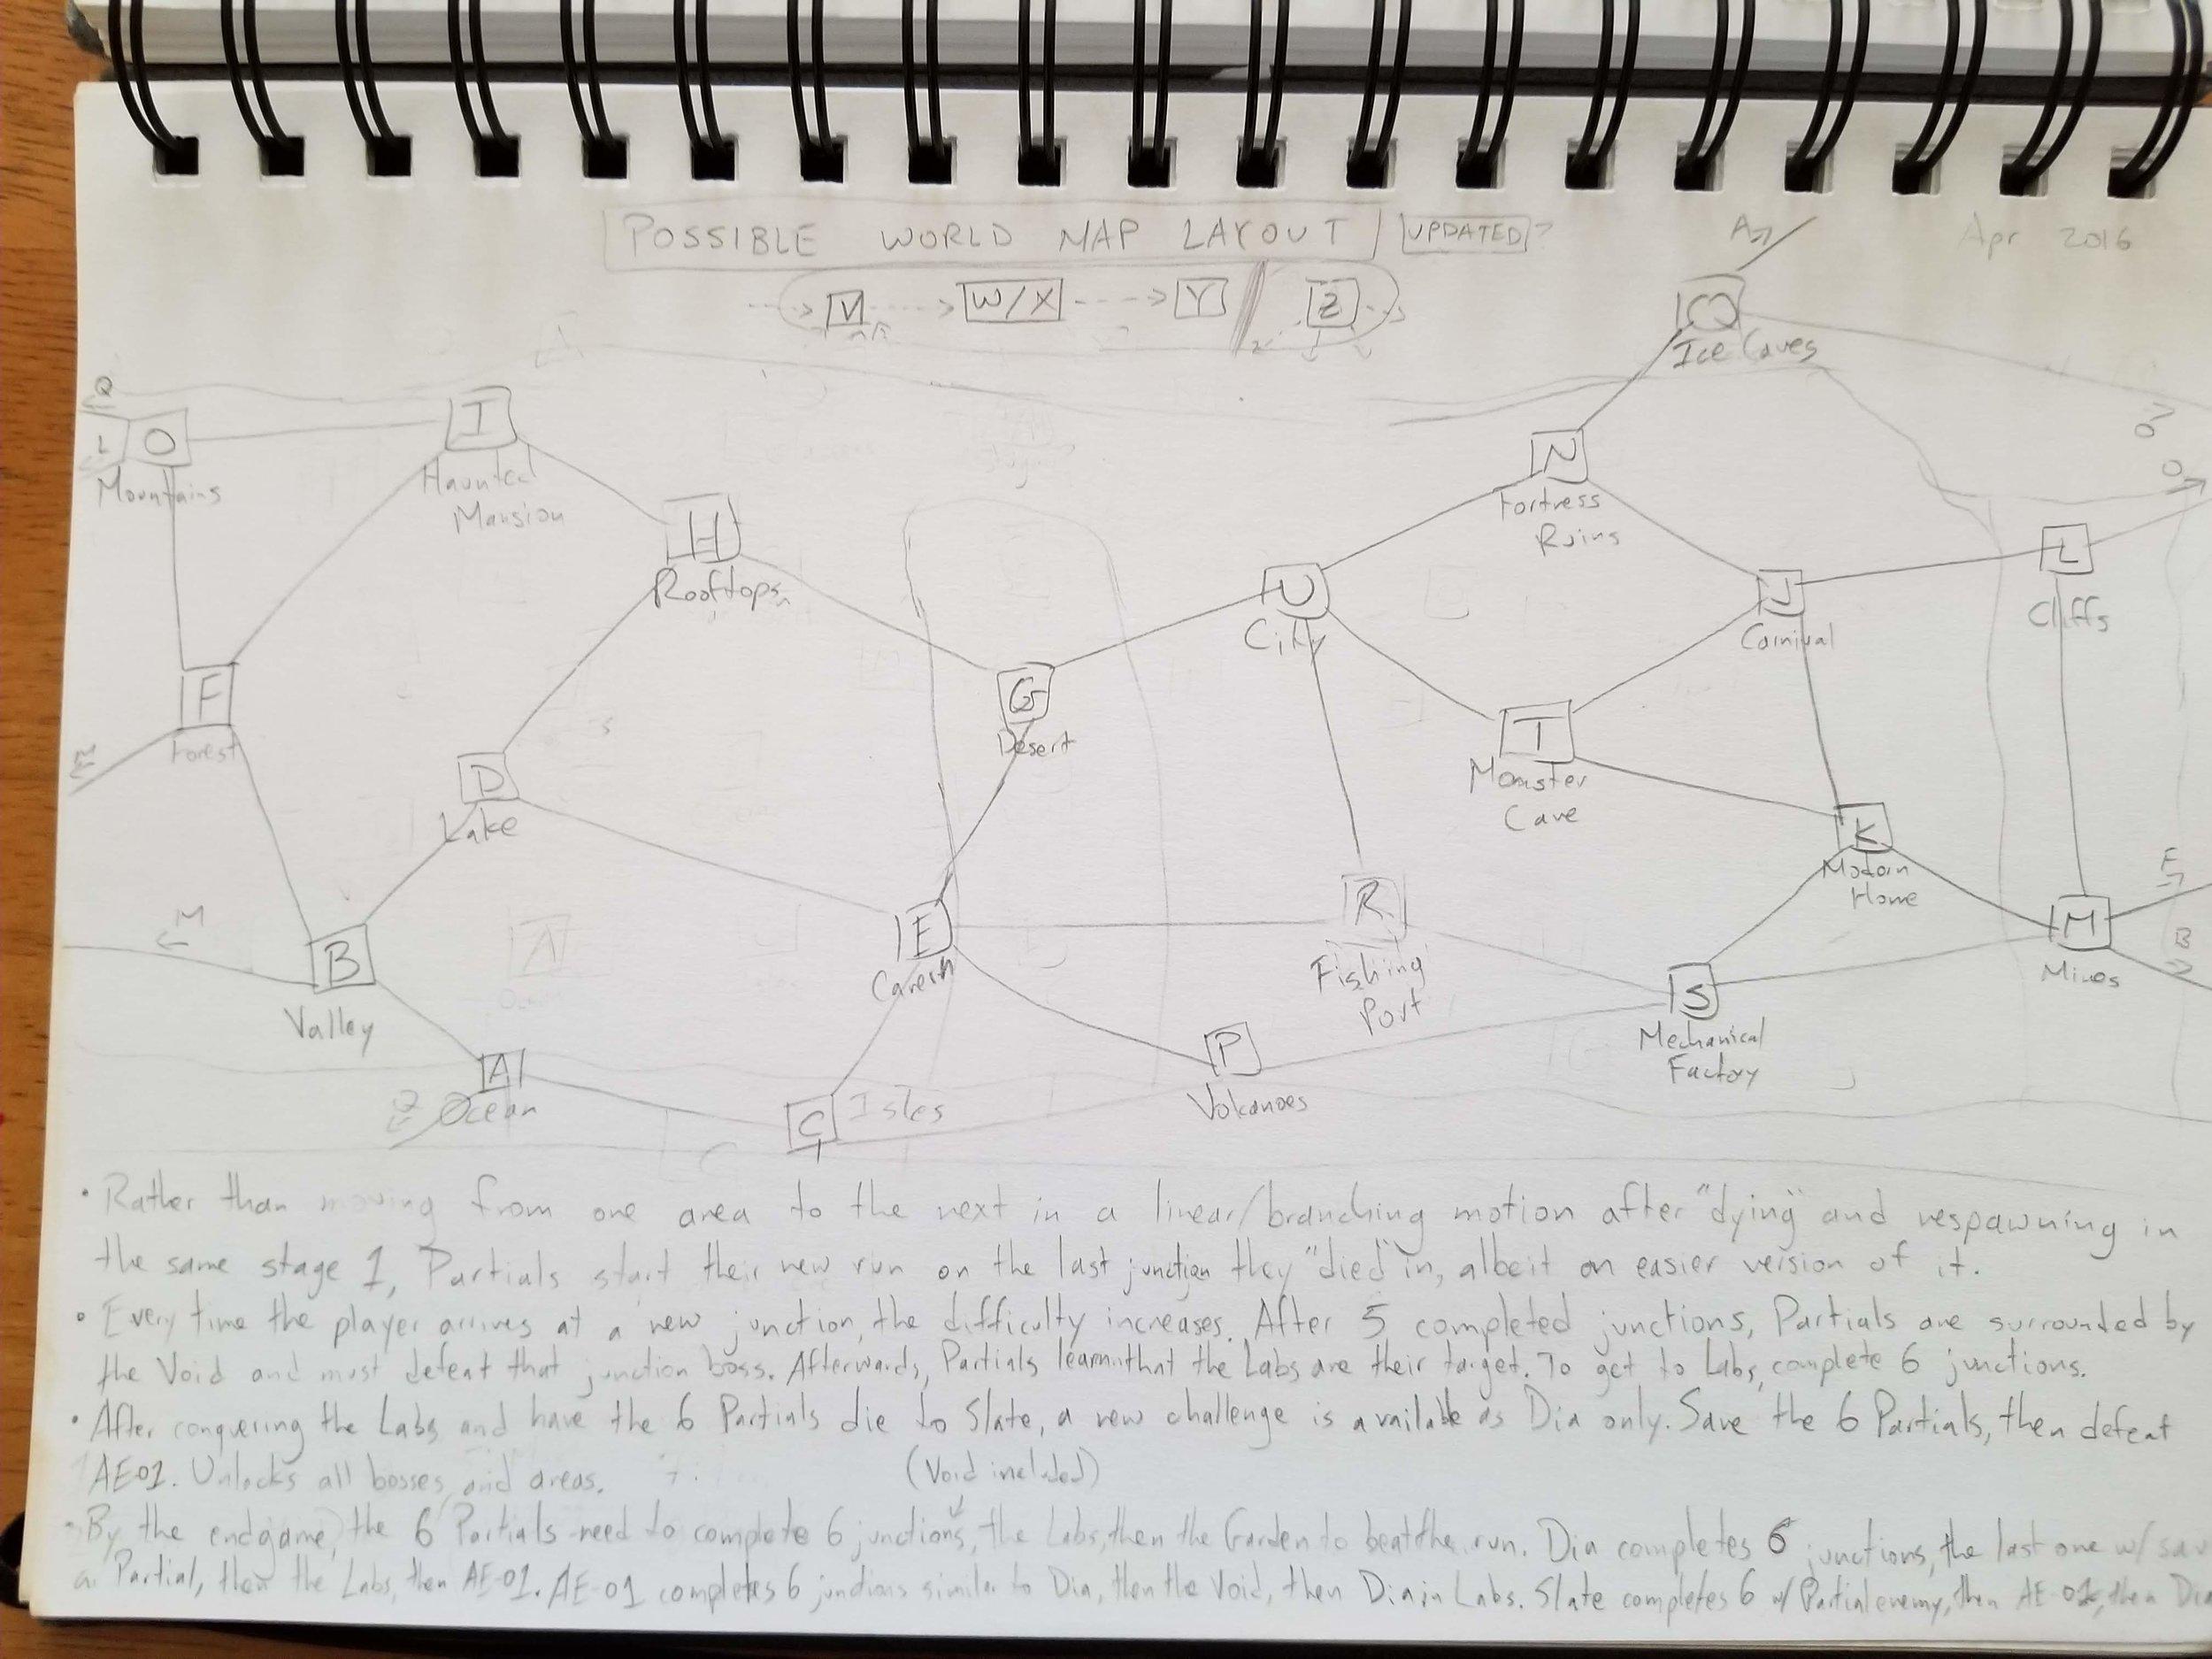 partial_notes_map4.jpg